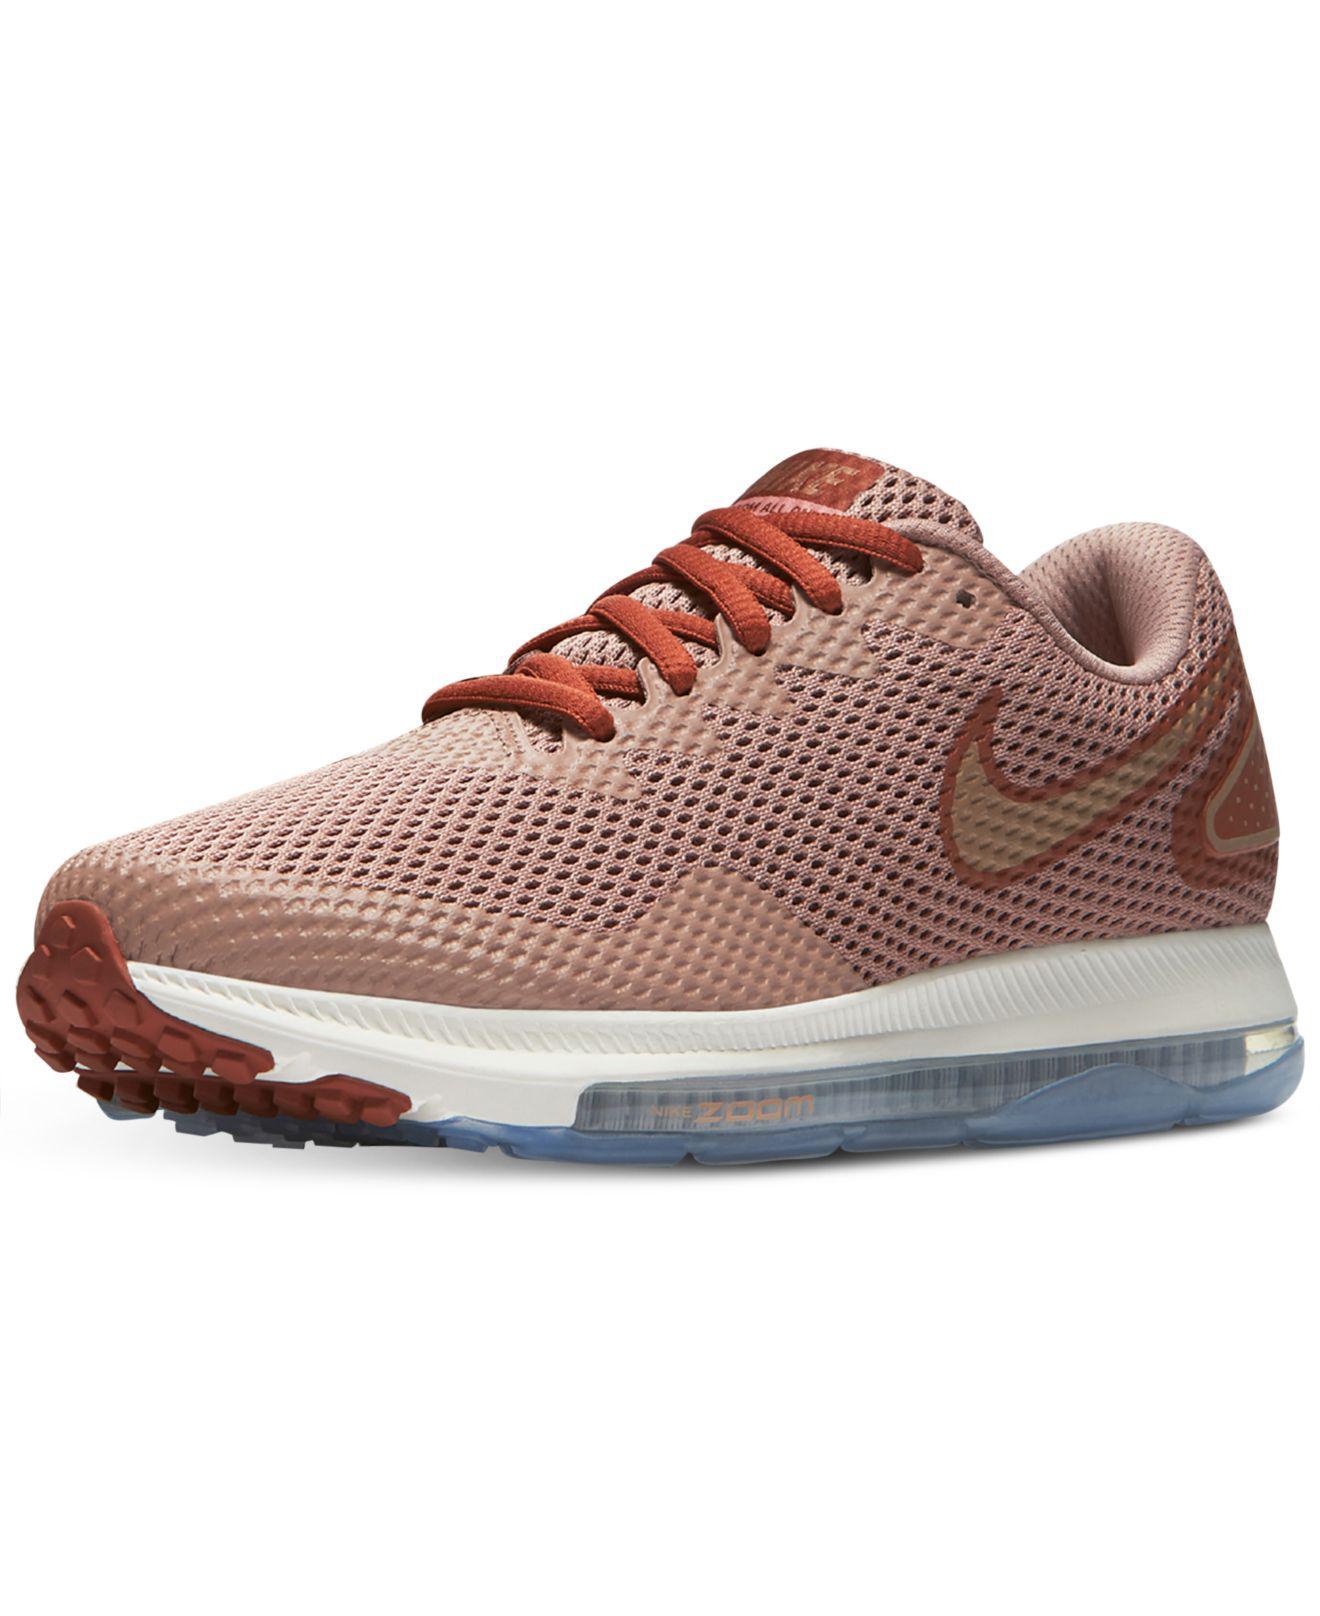 ... 637b0 Lyst - Nike Womens Zoom All Out Low 2 Running Sneakers From   footwear babf5 84dd9 Nike. Womens Flex 2017 Run Running Sneakers from Finish  Line. e7444b6b5